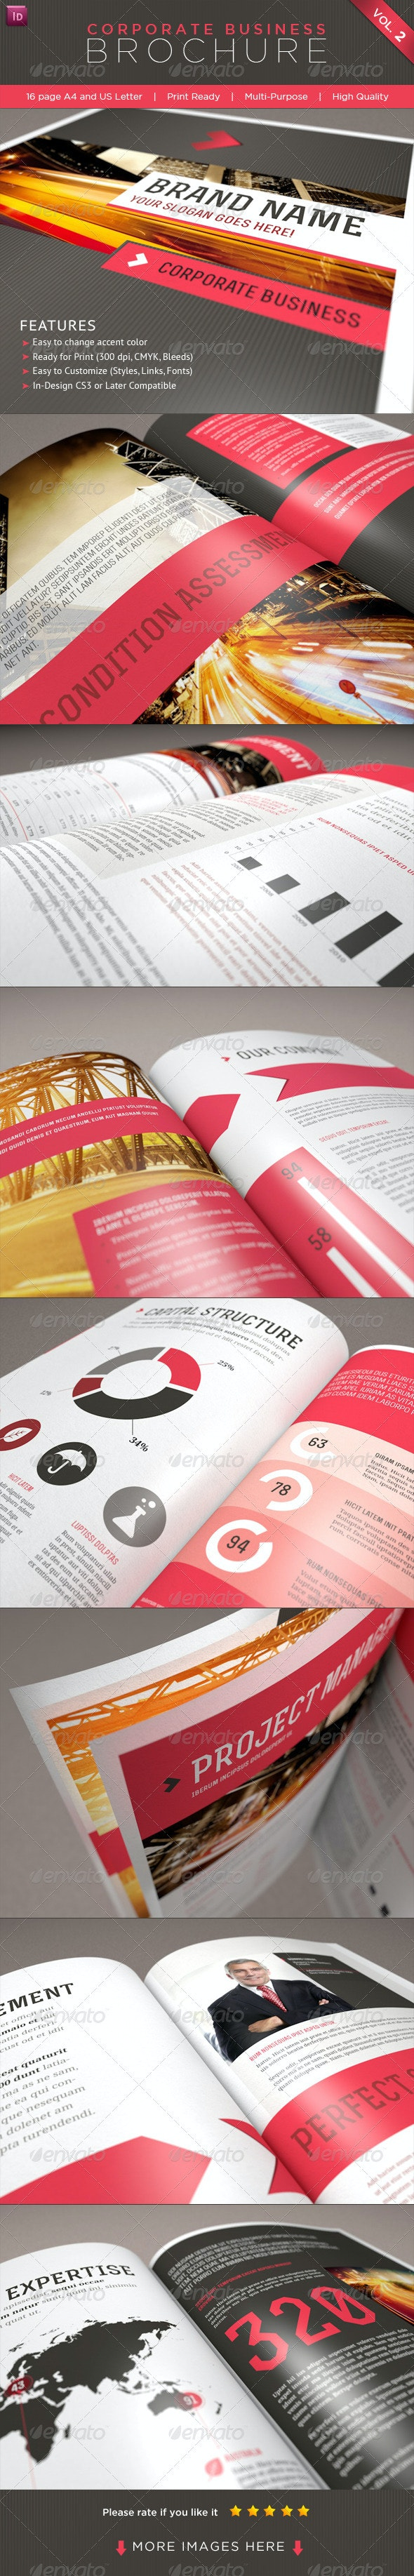 Professional Corporate Business Brochure Vol. 2 - Corporate Brochures